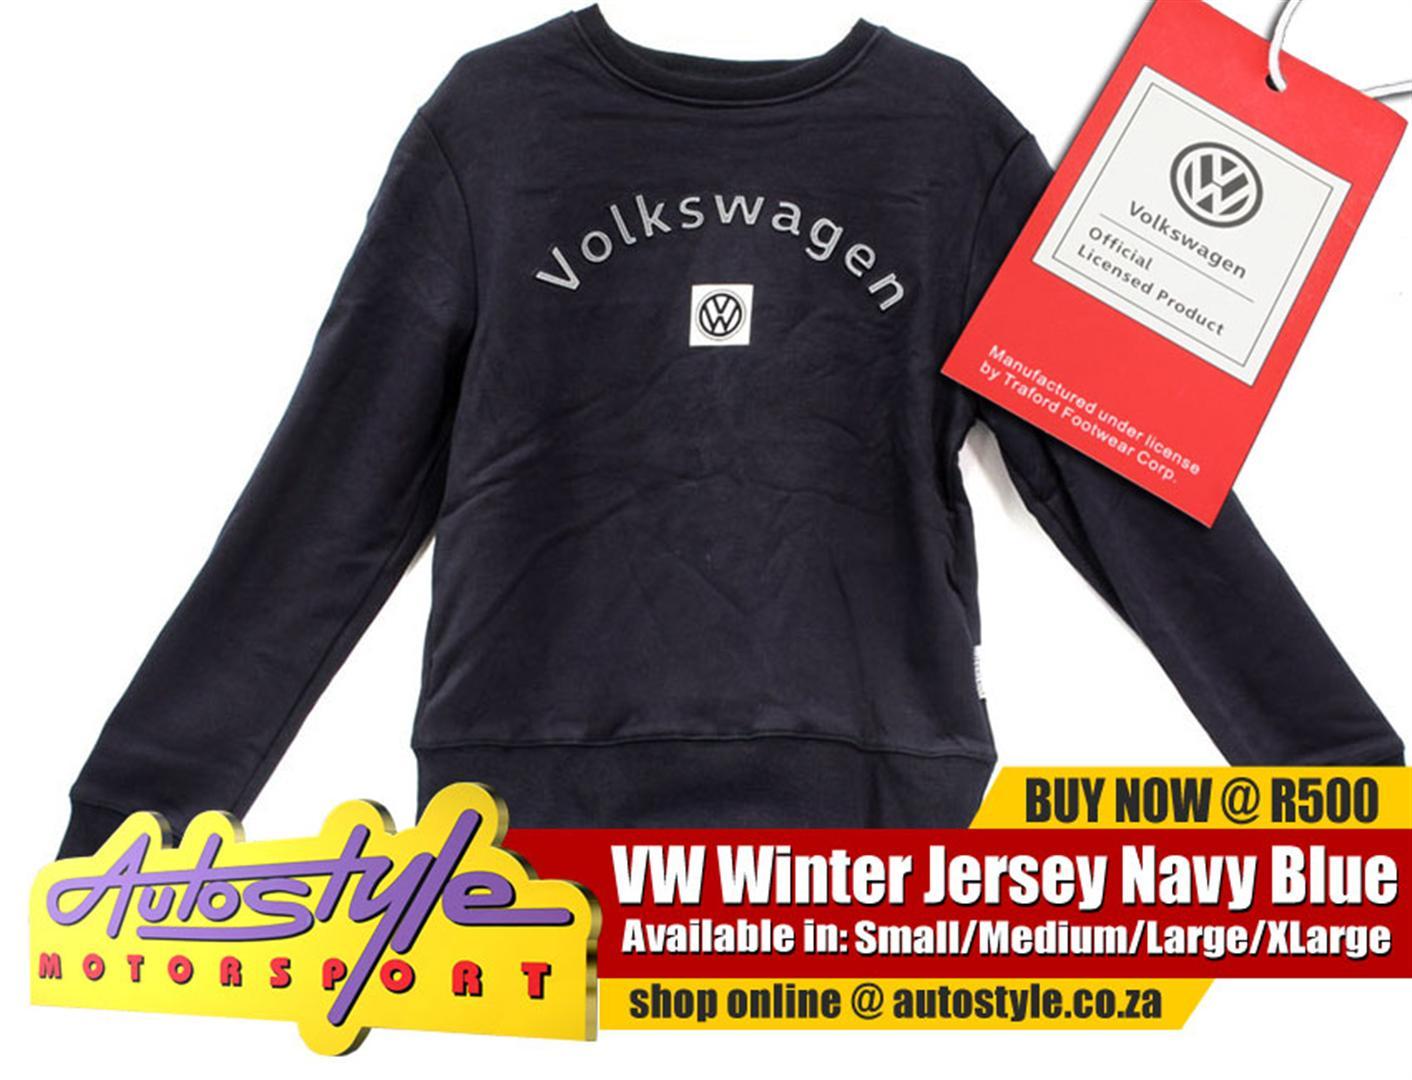 vw gti activewear track set, track suit set , GTI Volkswagen activewear, jogger pants, winter jerseys, track pants, track sets, track suits. Original Licensed Products.